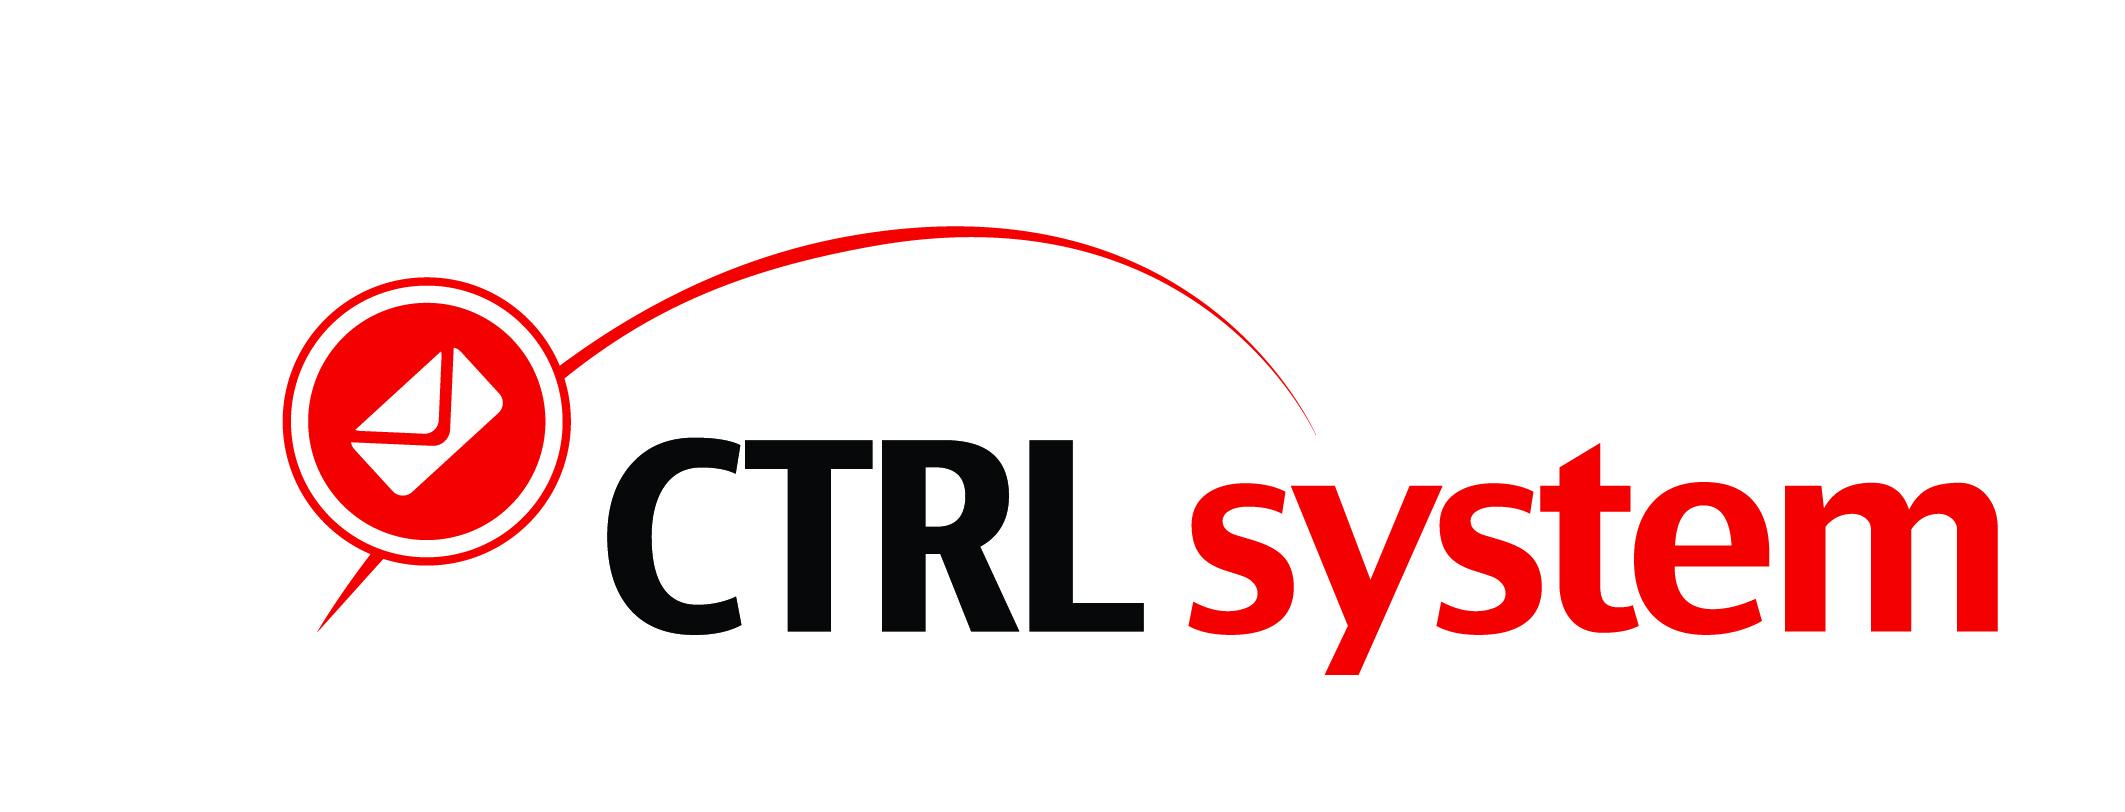 CTRL System logo